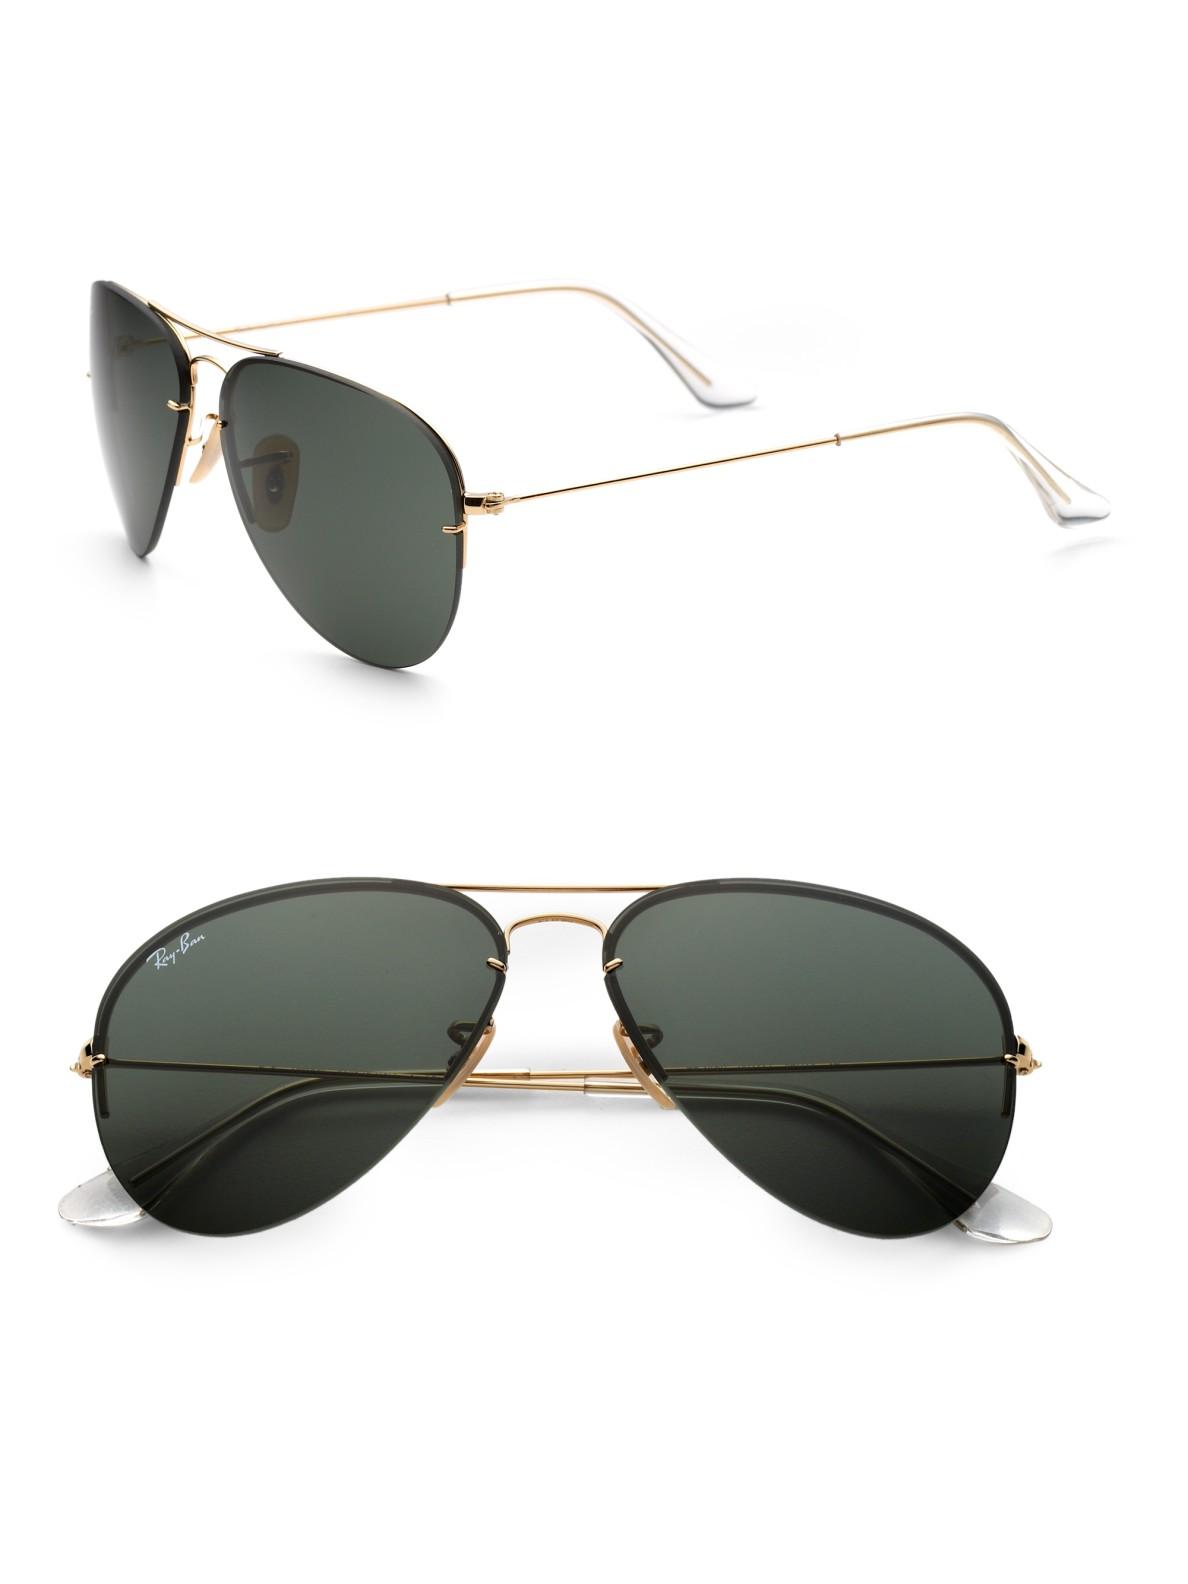 9ca5f64ddb5c2 Ray-Ban Interchangeable Lens Aviator Sunglasses in Metallic - Lyst